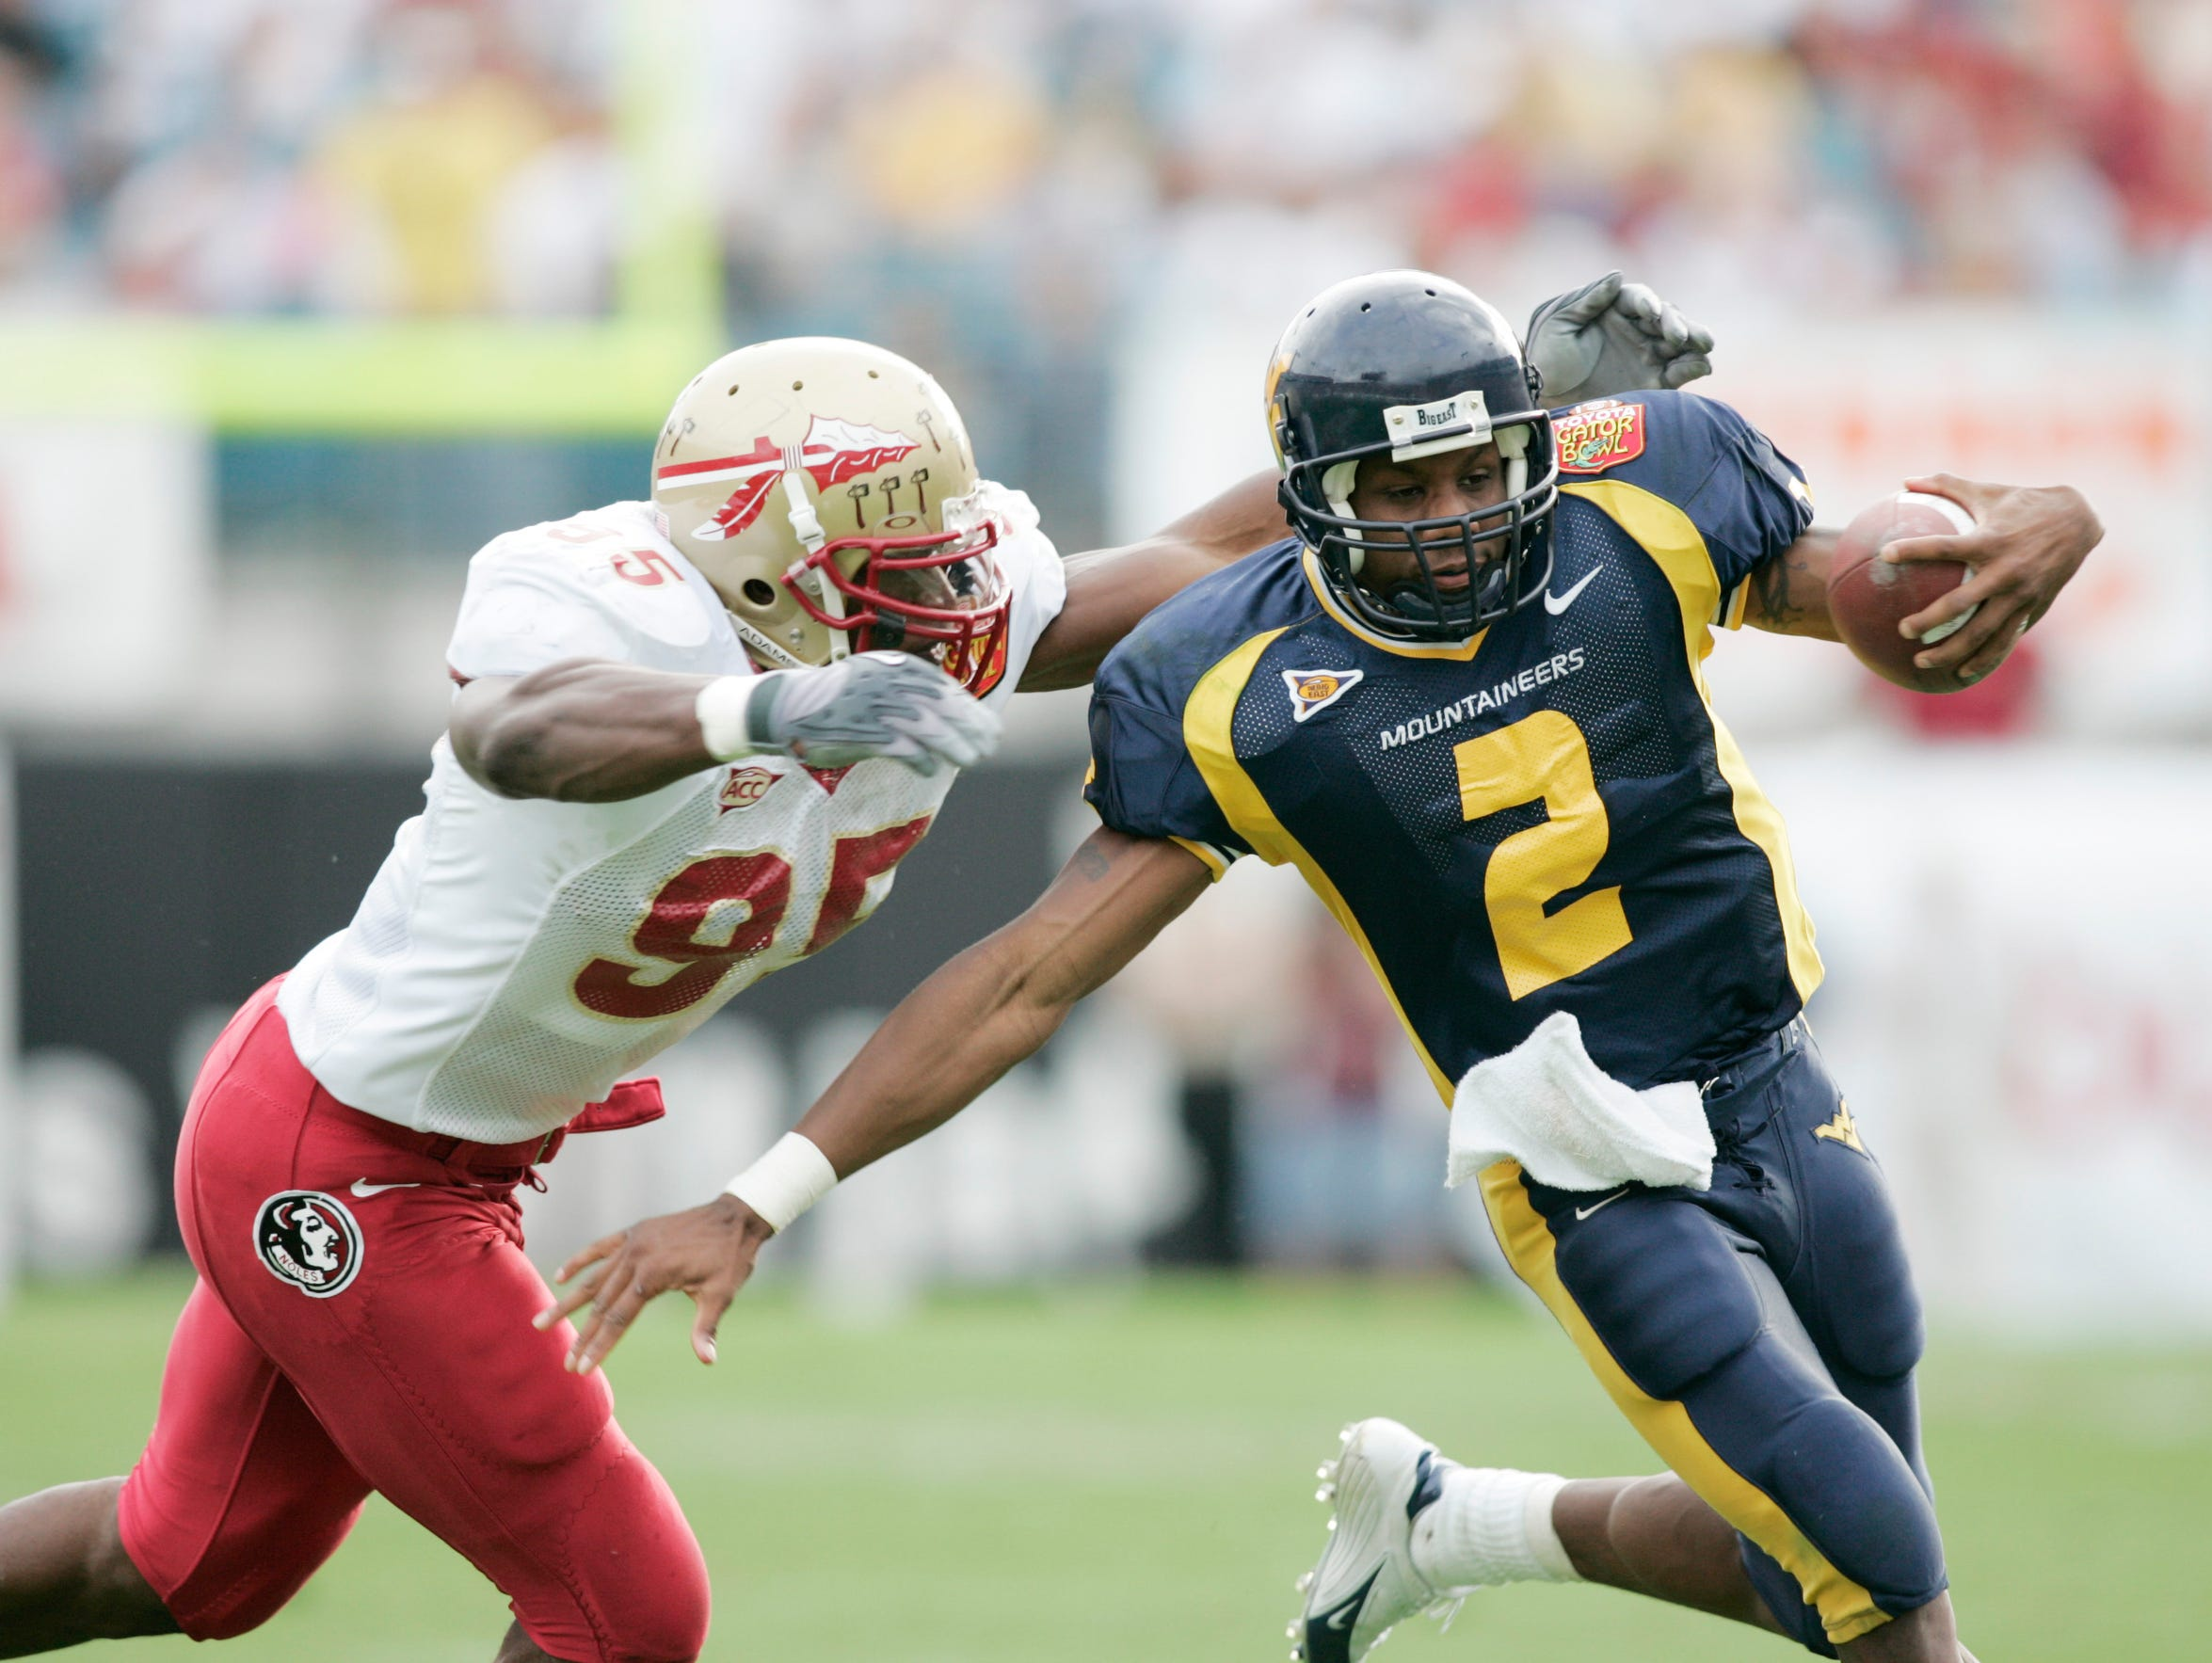 Florida State Seminoles defensive end Kamerion Wimbley